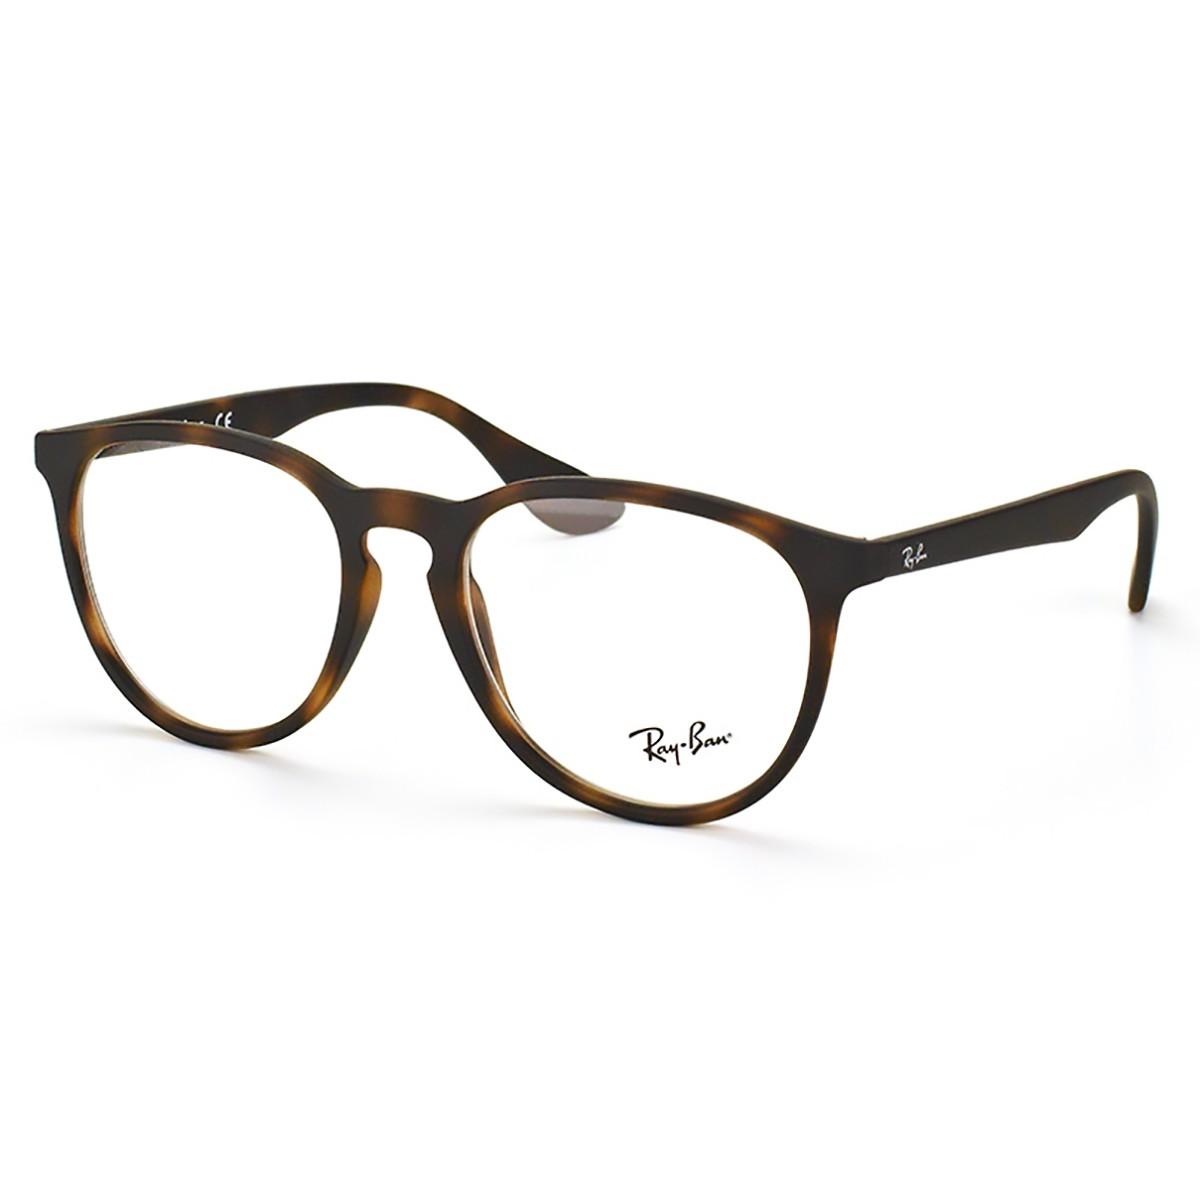 a09cd4d36e1d9 Compre Óculos de Grau Ray Ban em 10X